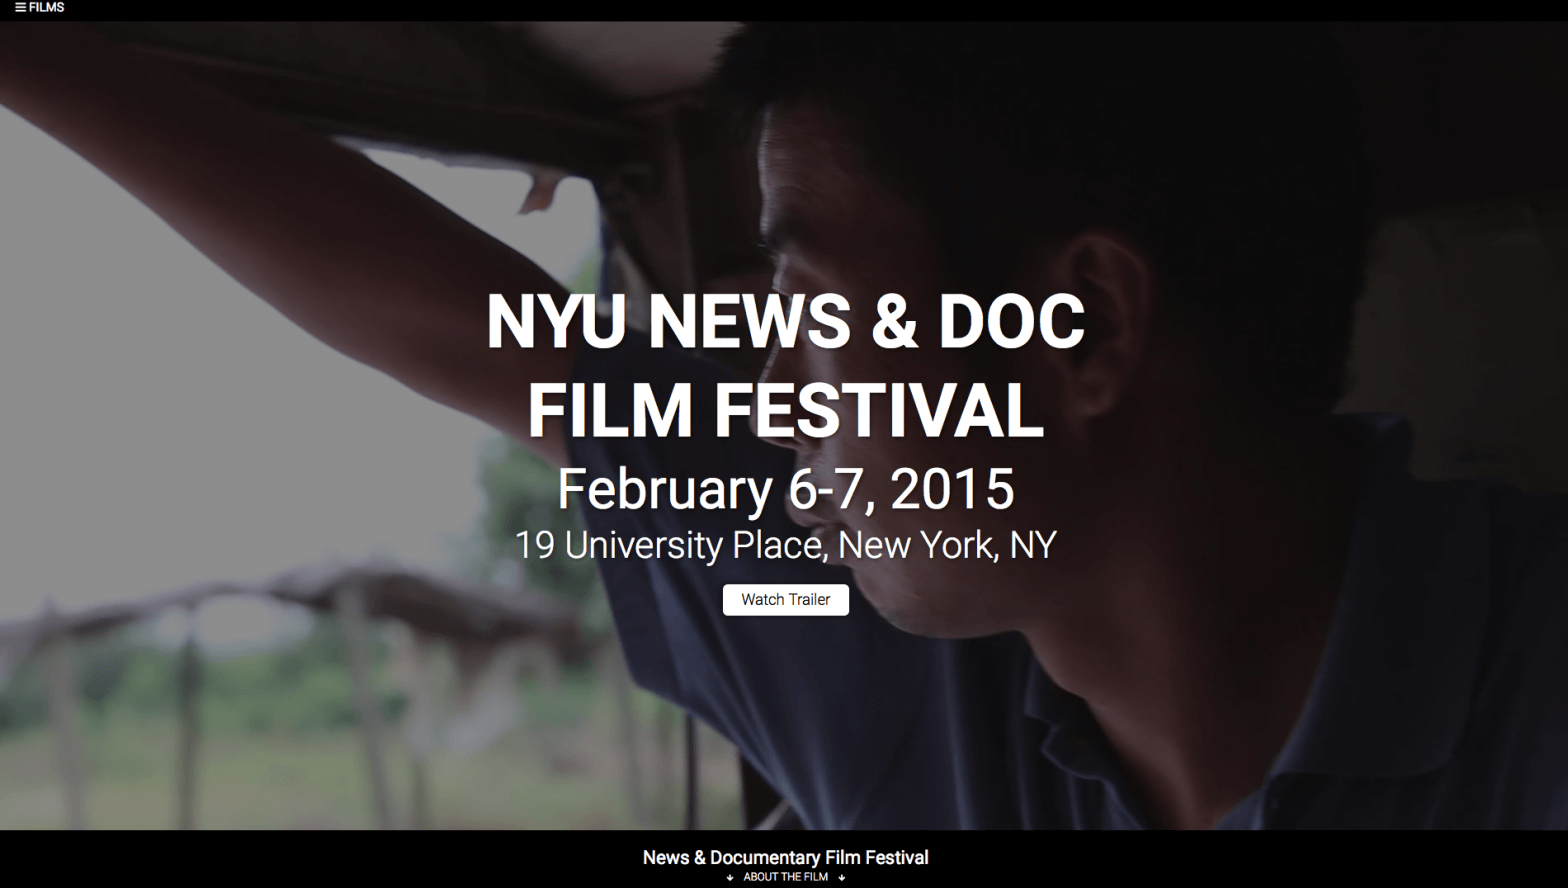 NYU NewsDoc Film Festival